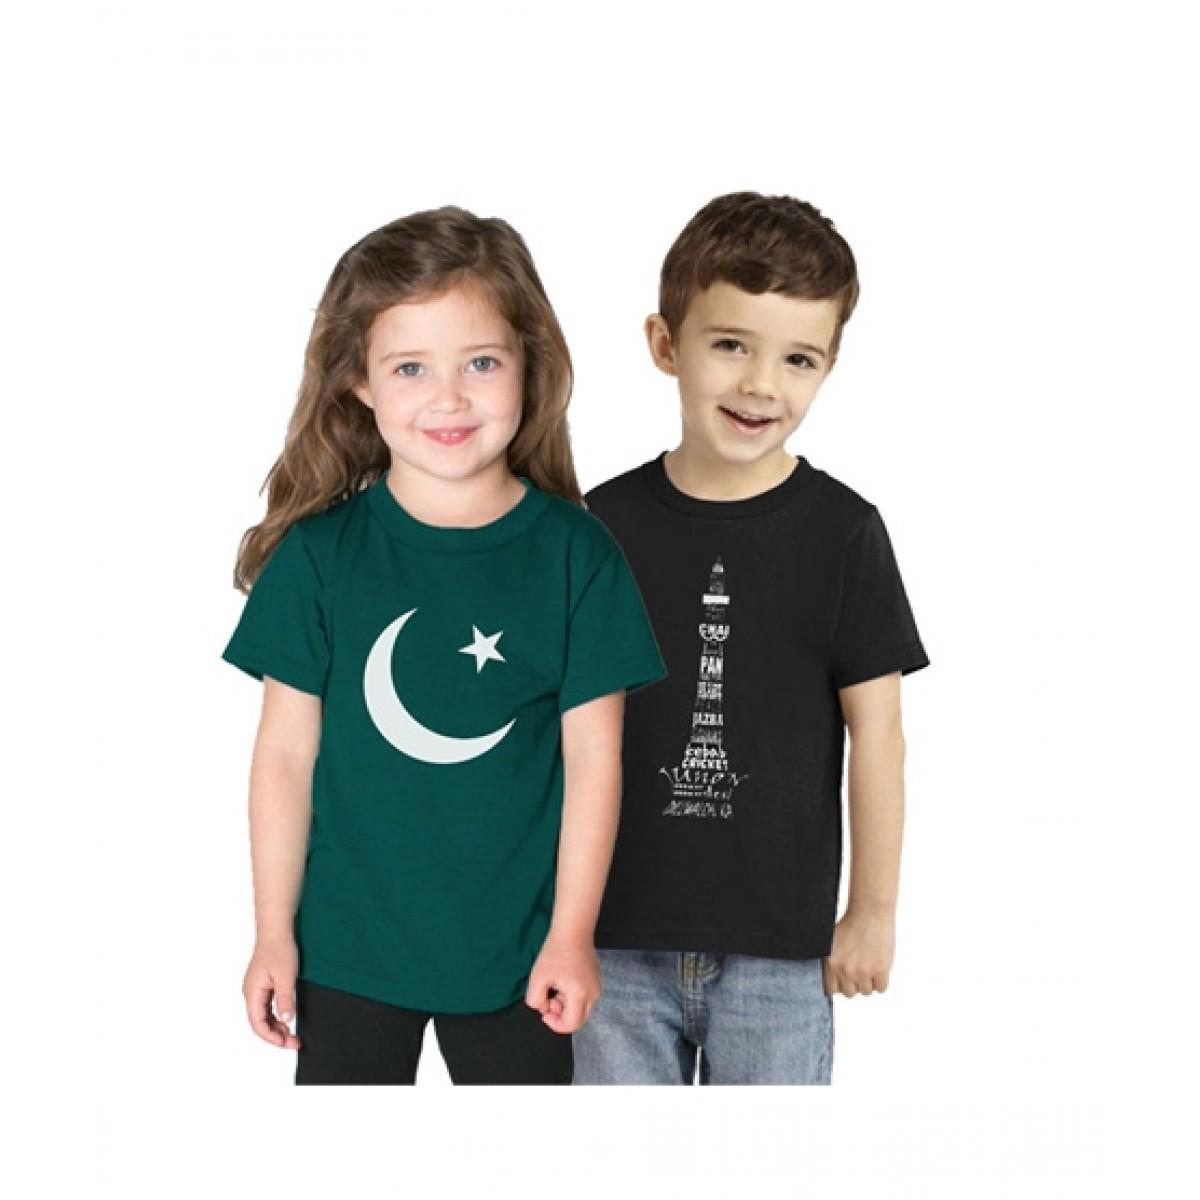 bd39484c C-Tees Pack Of 2 Pakistan Day T-Shirt Price in Pakistan | Buy C-Tees T-Shirt  For Kids (CKT10113) | iShopping.pk